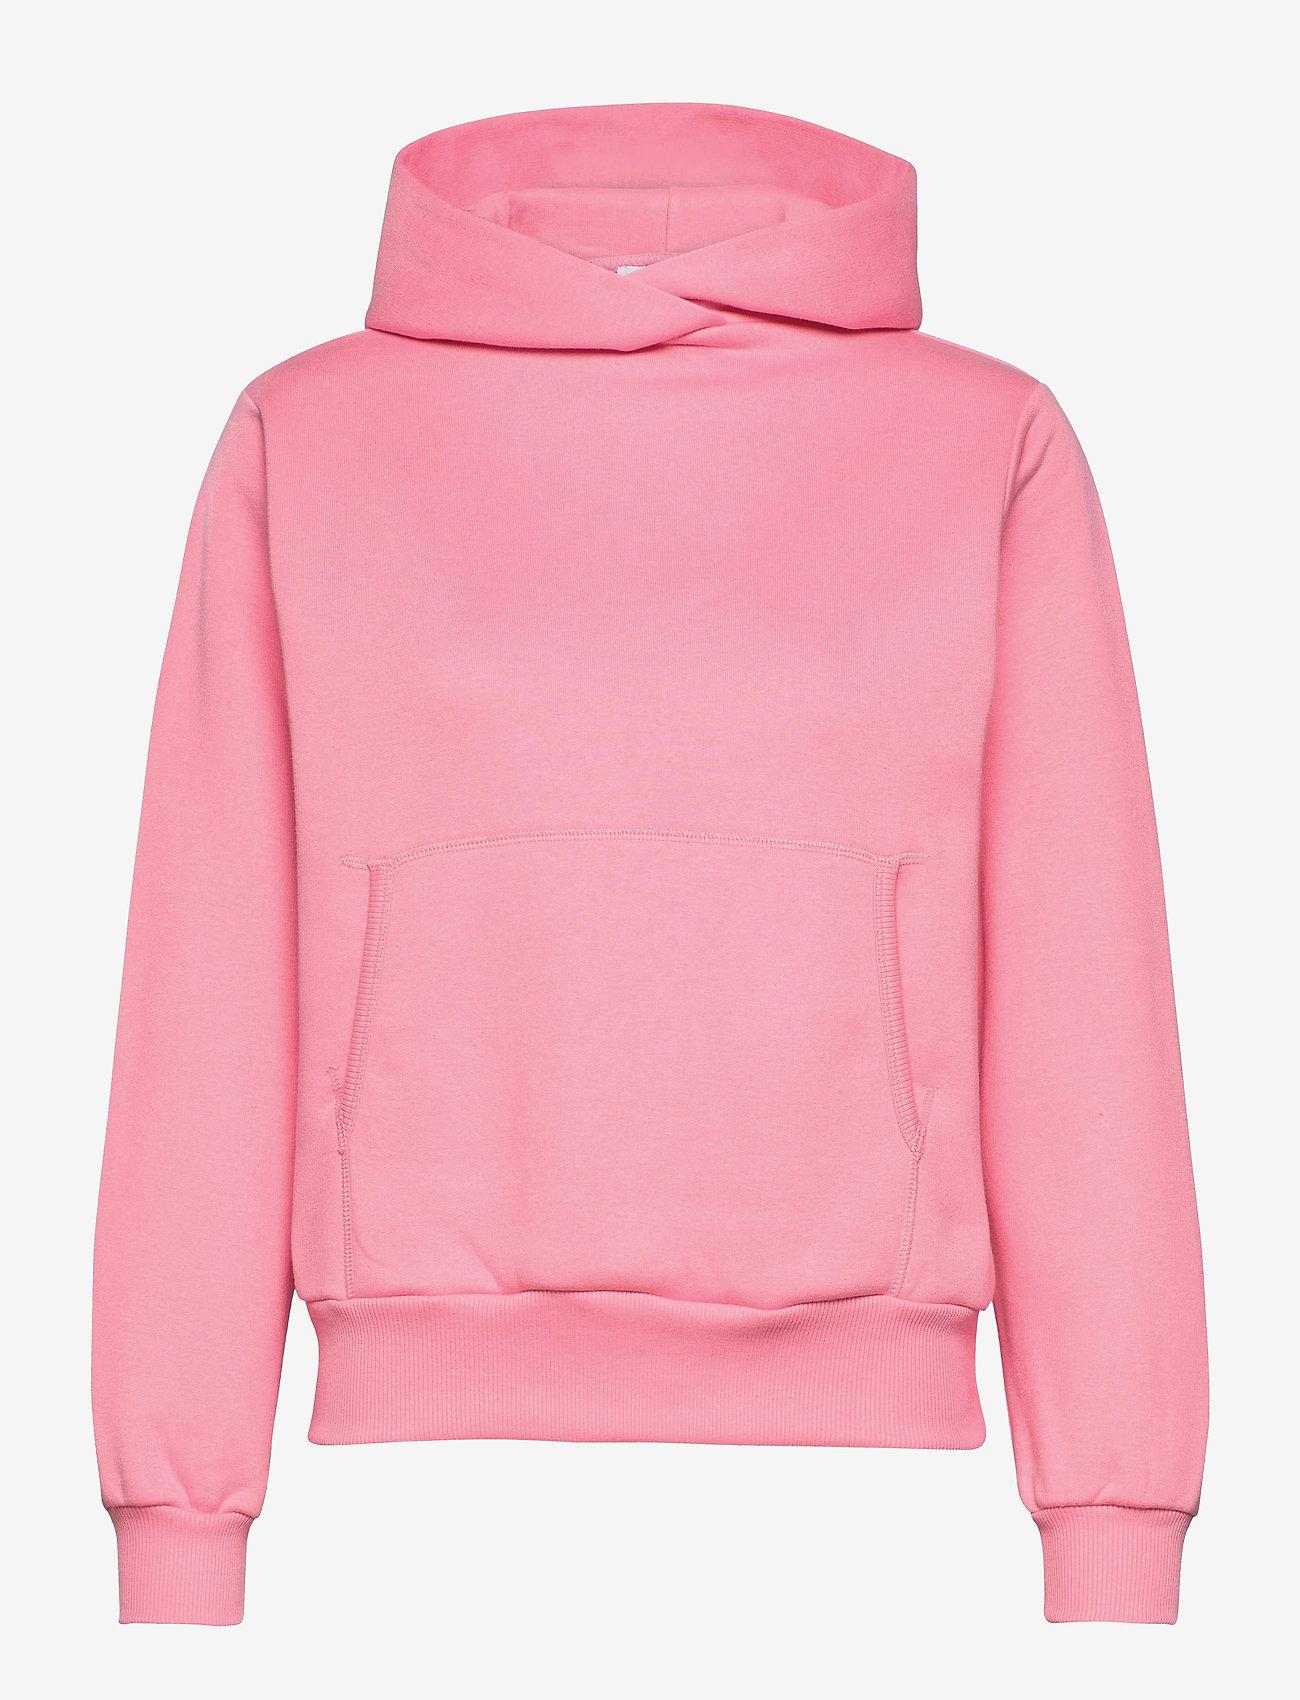 RODEBJER - RODEBJER MONOGRAM - sweatshirts & hættetrøjer - cherry blossom - 0